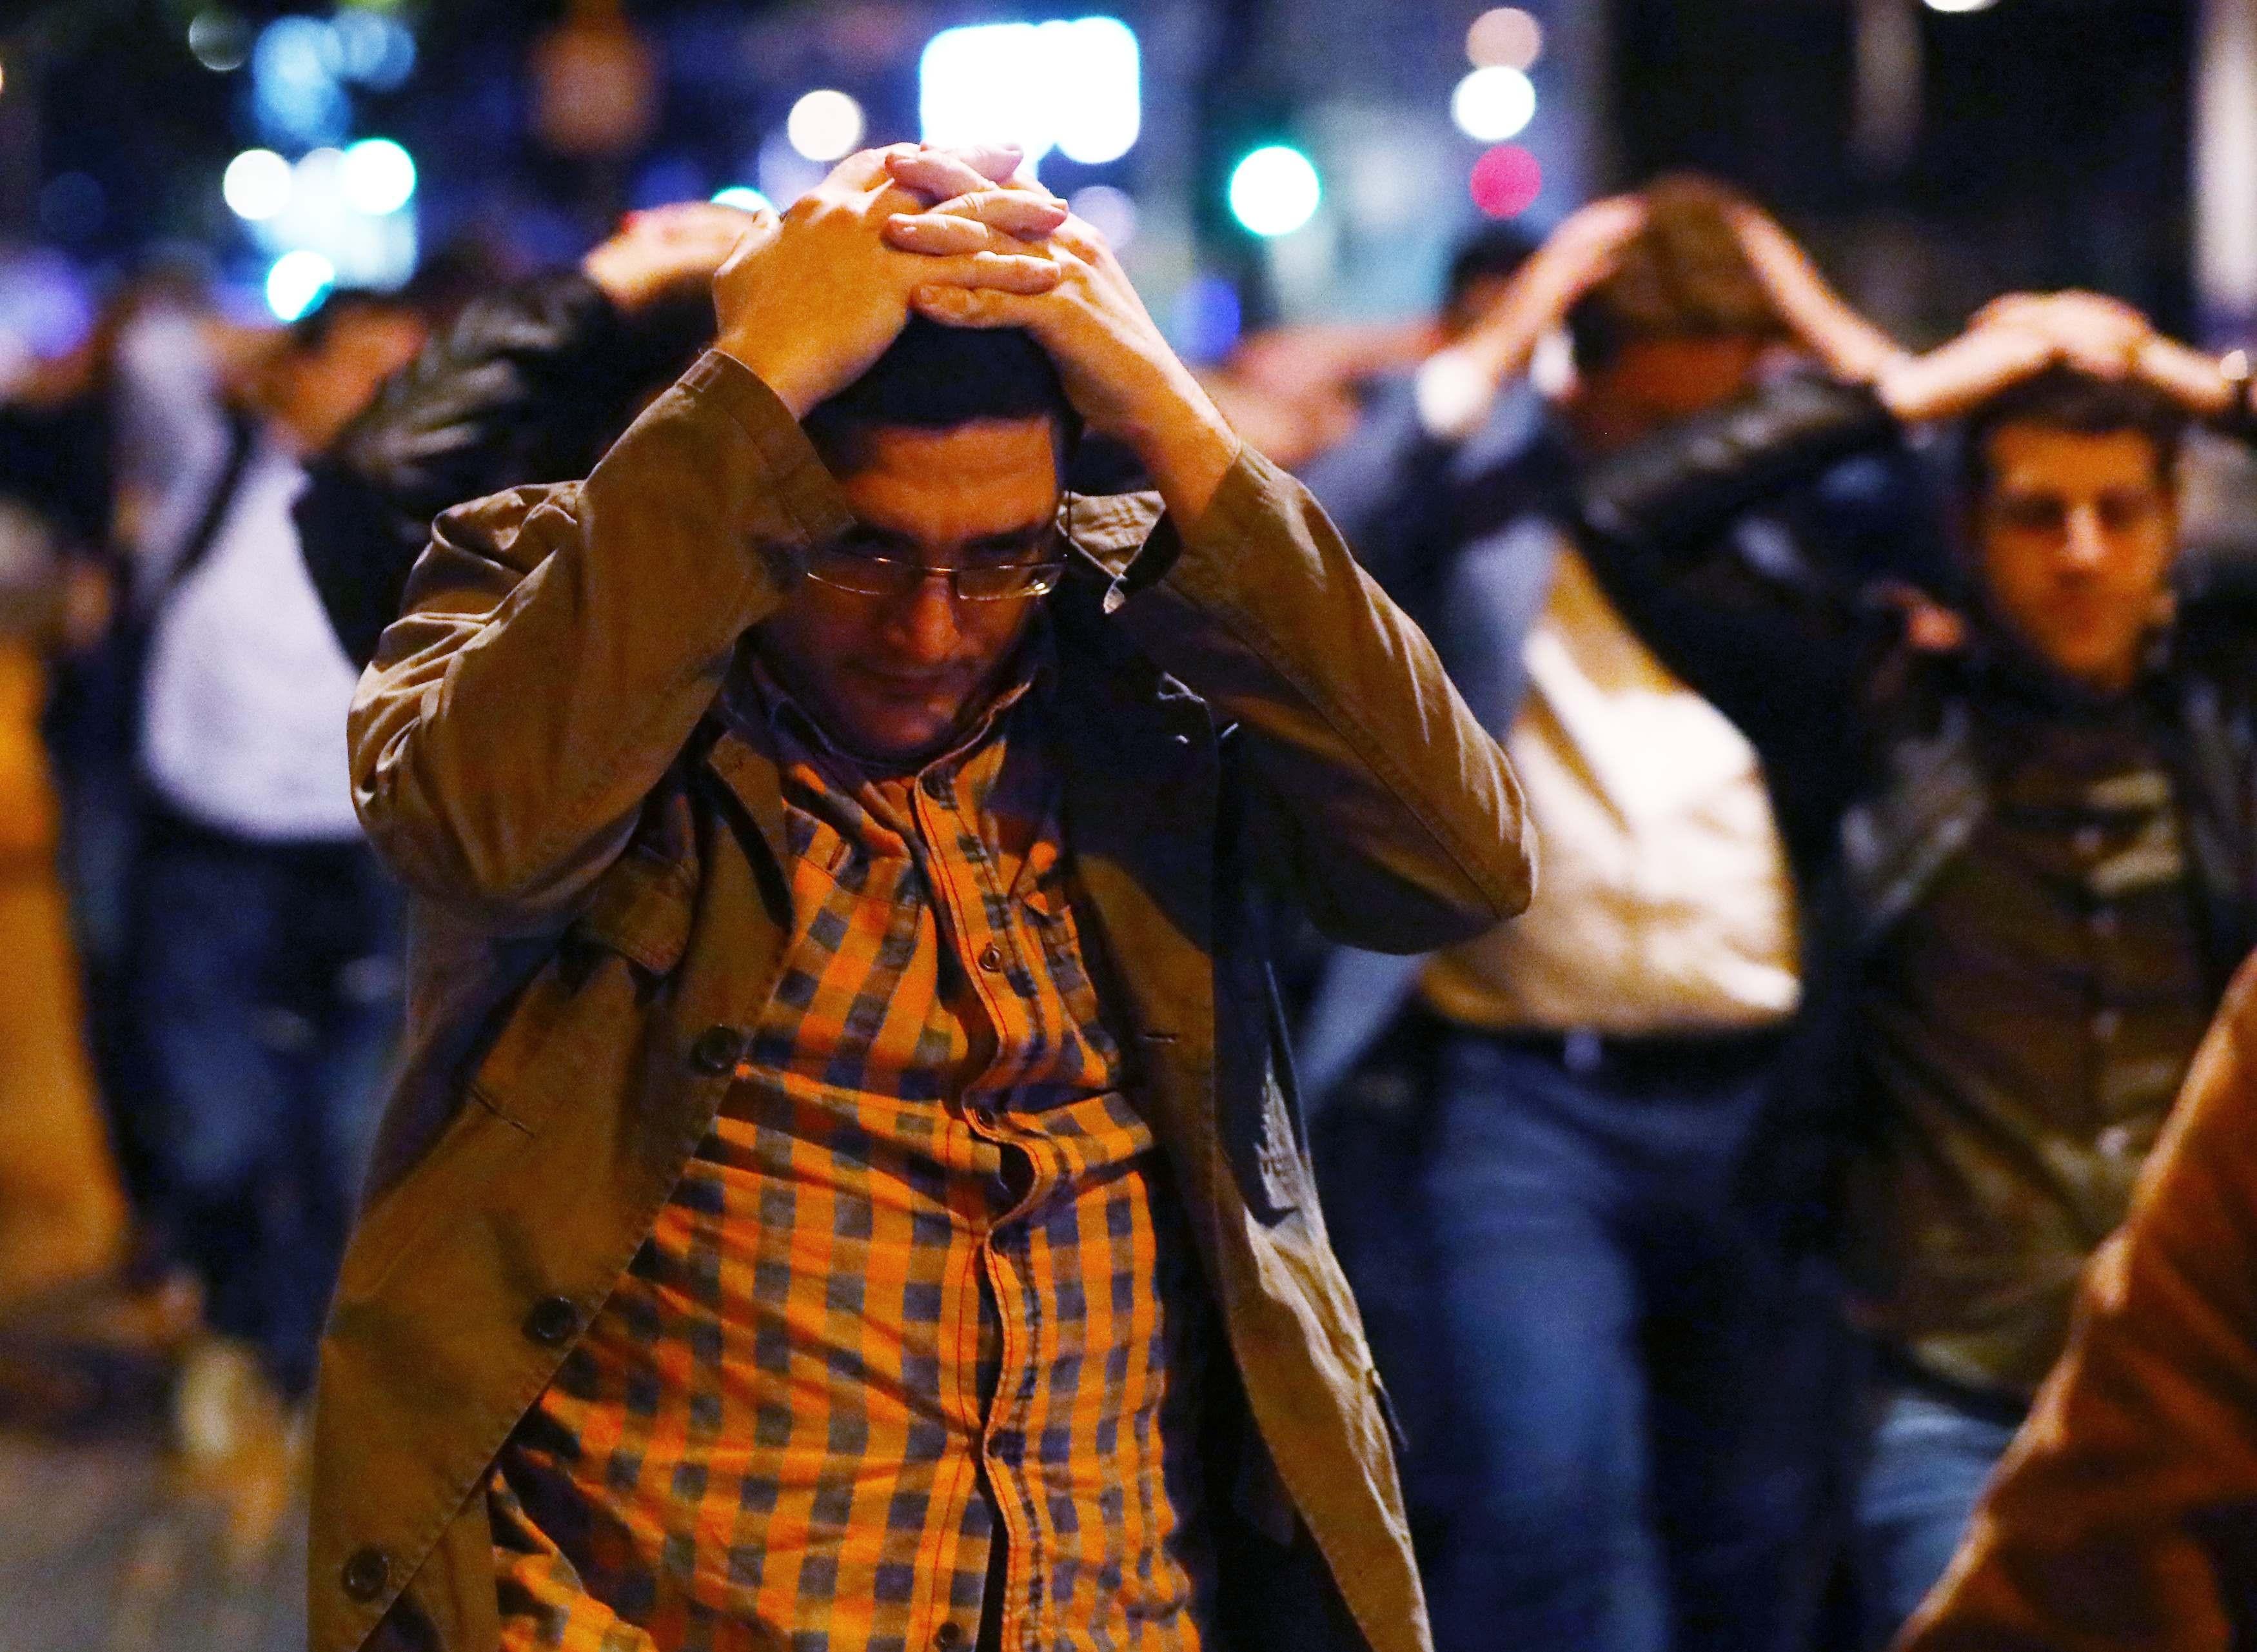 <p>После теракта в Лондоне в ночь с 3 на 4 июня. Фото: <span>&copy;&nbsp;</span>REUTERS/Neil Hall</p>